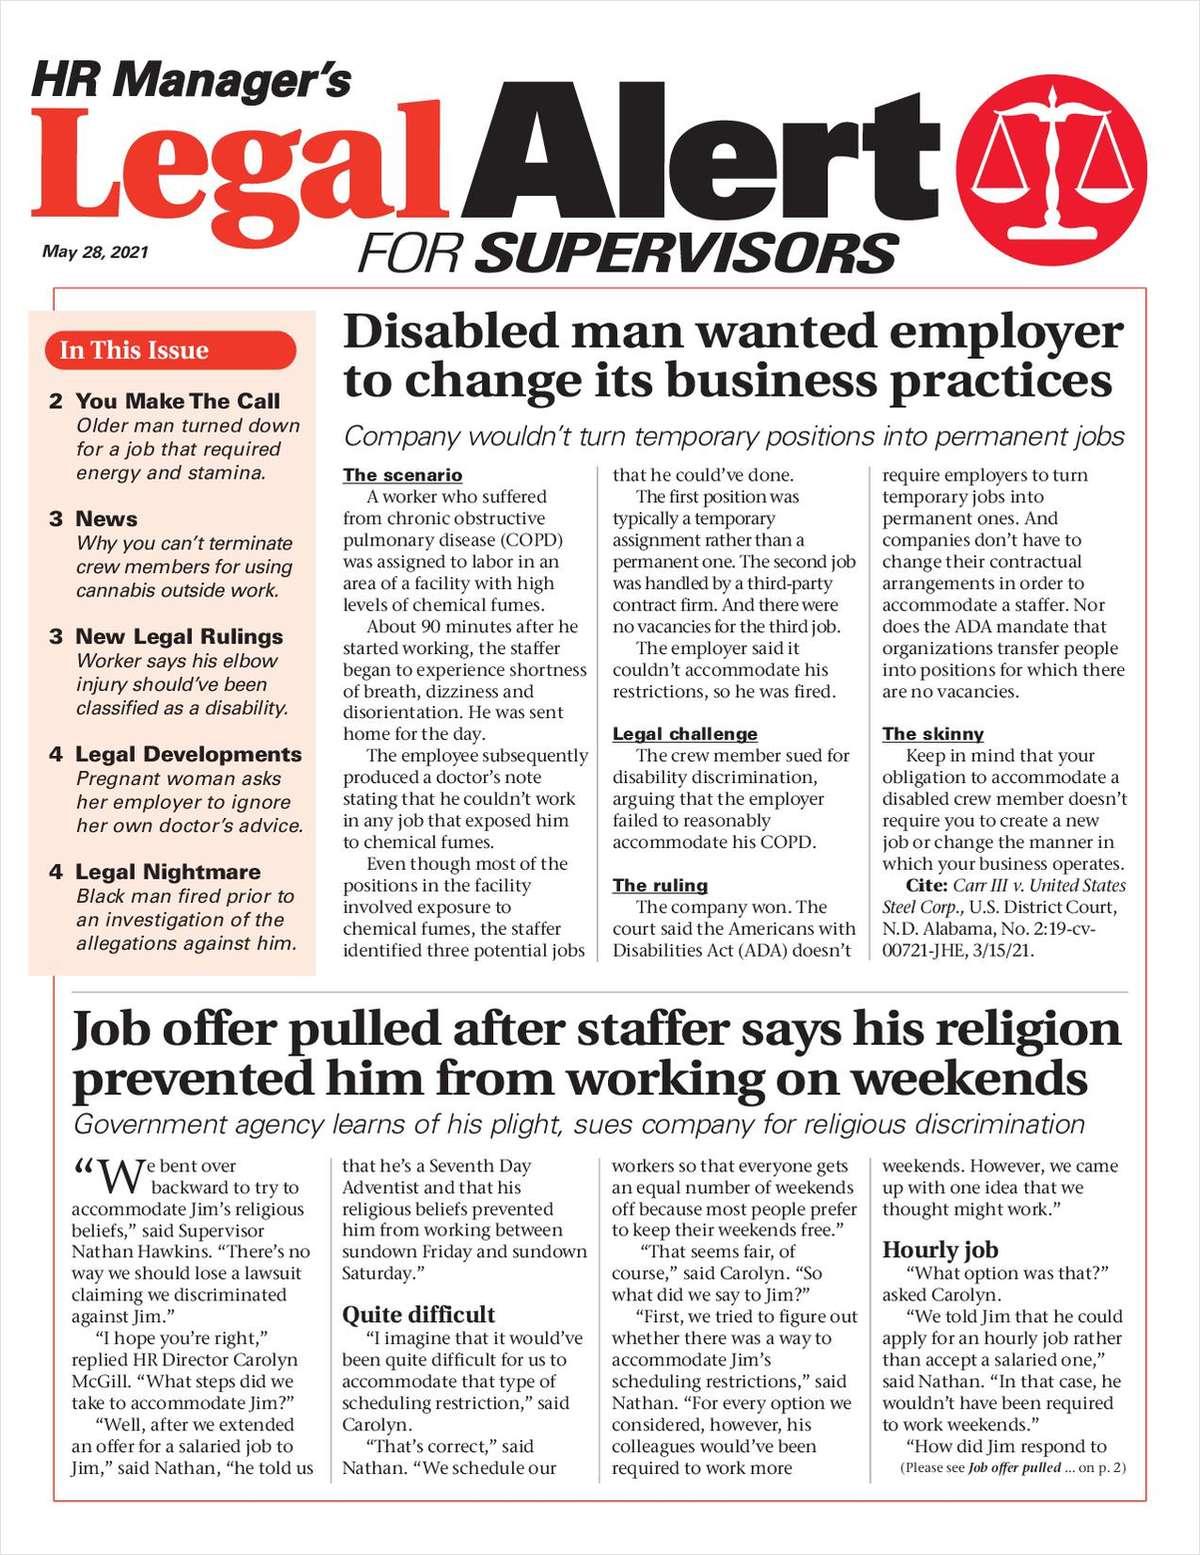 HR Manager's Legal Alert for Supervisors Newsletter: May 28 Edition